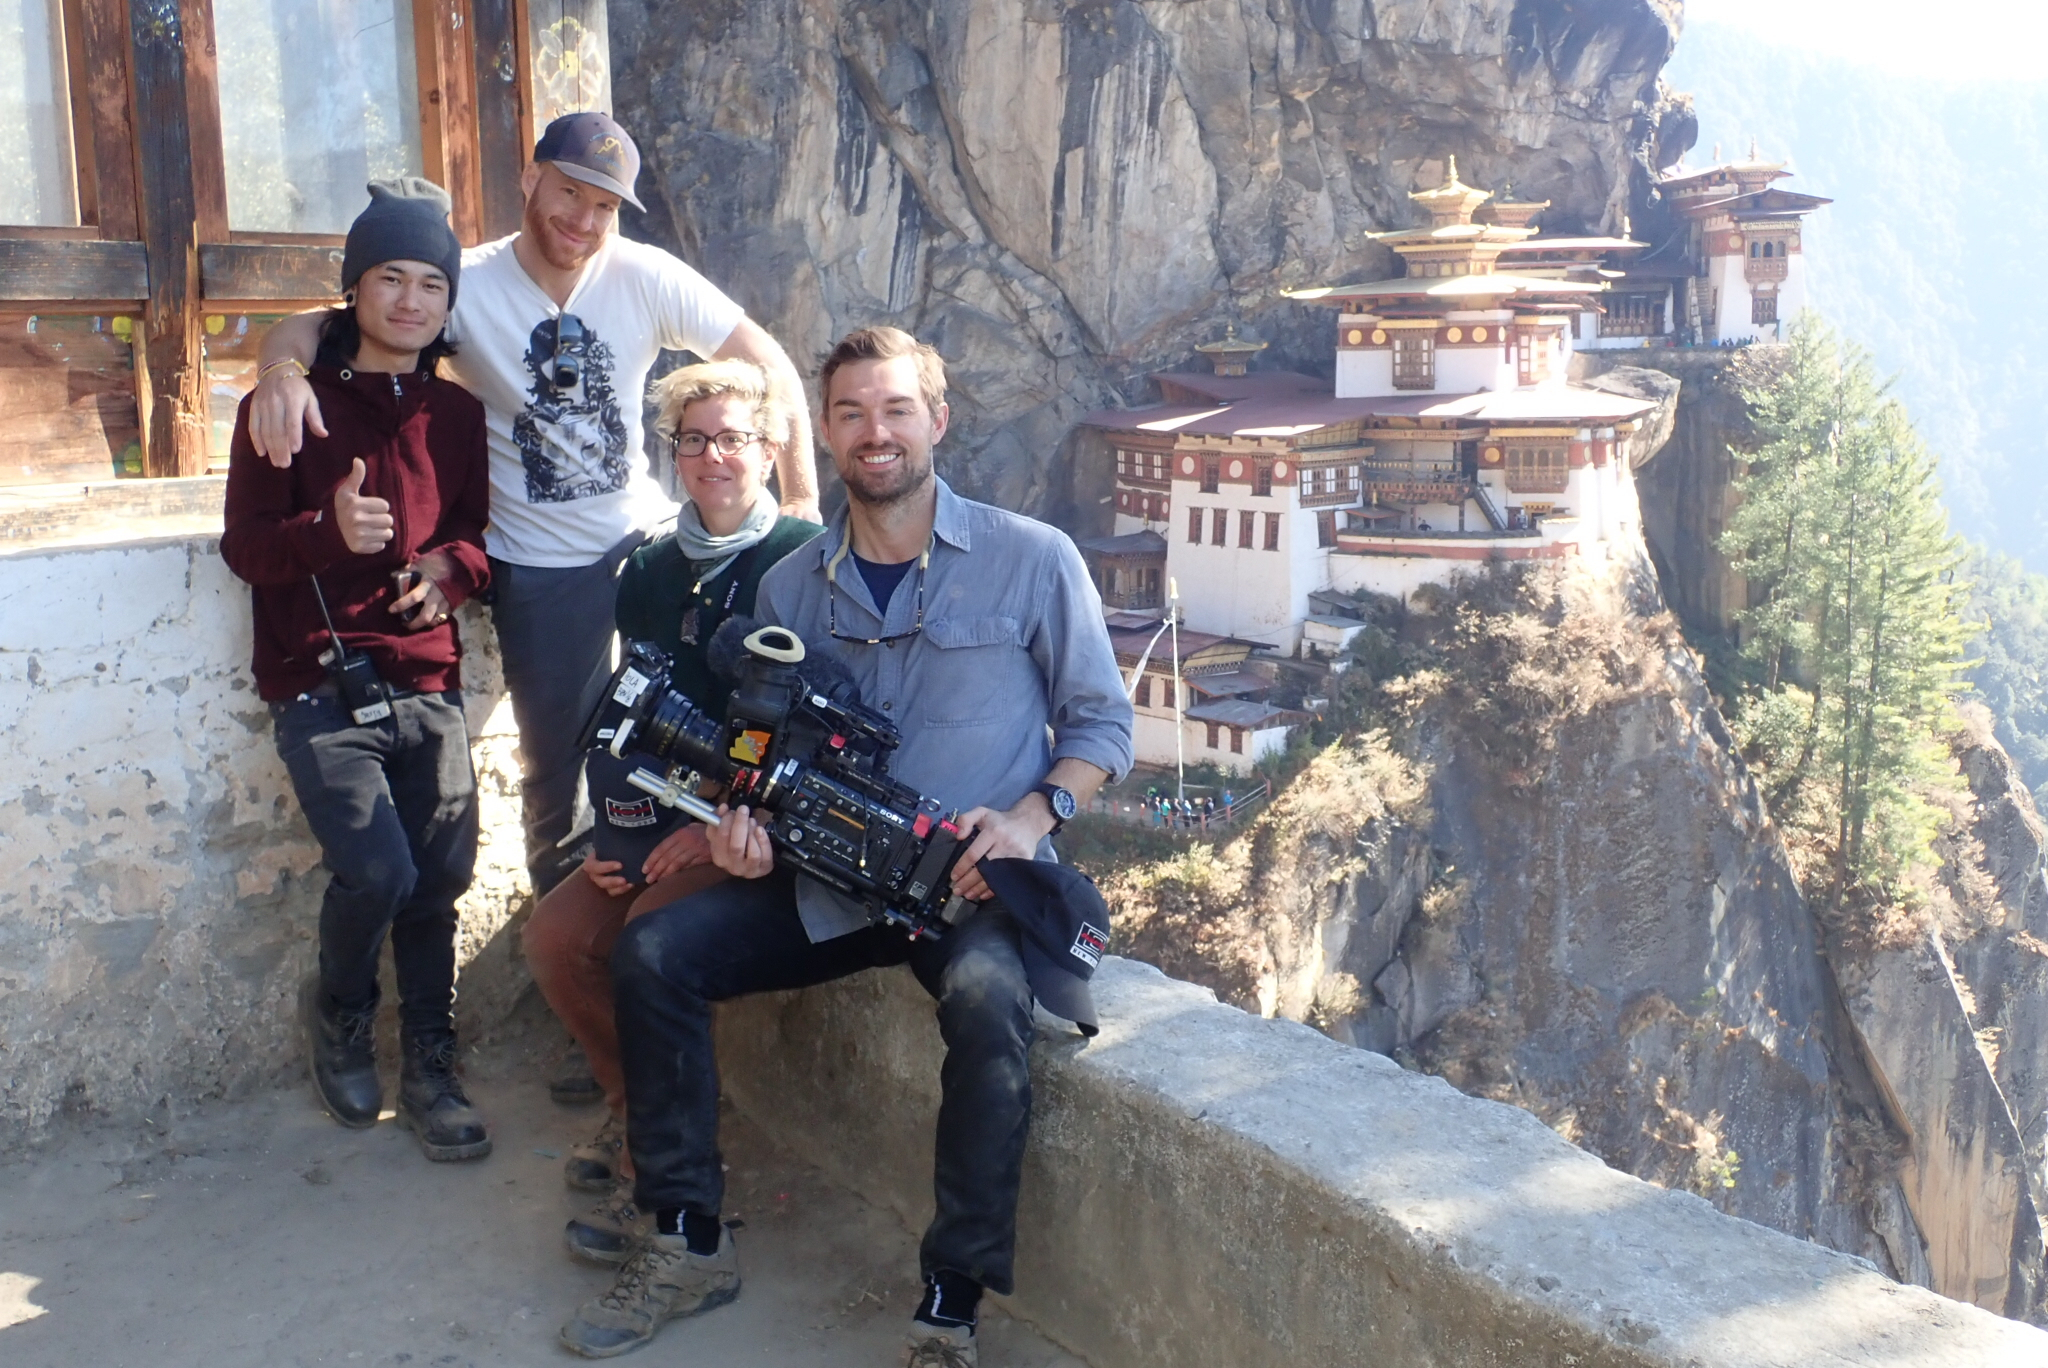 Taking a break from shooting near Paro Taktsang. Photo courtesy of Joshua Flannigan.